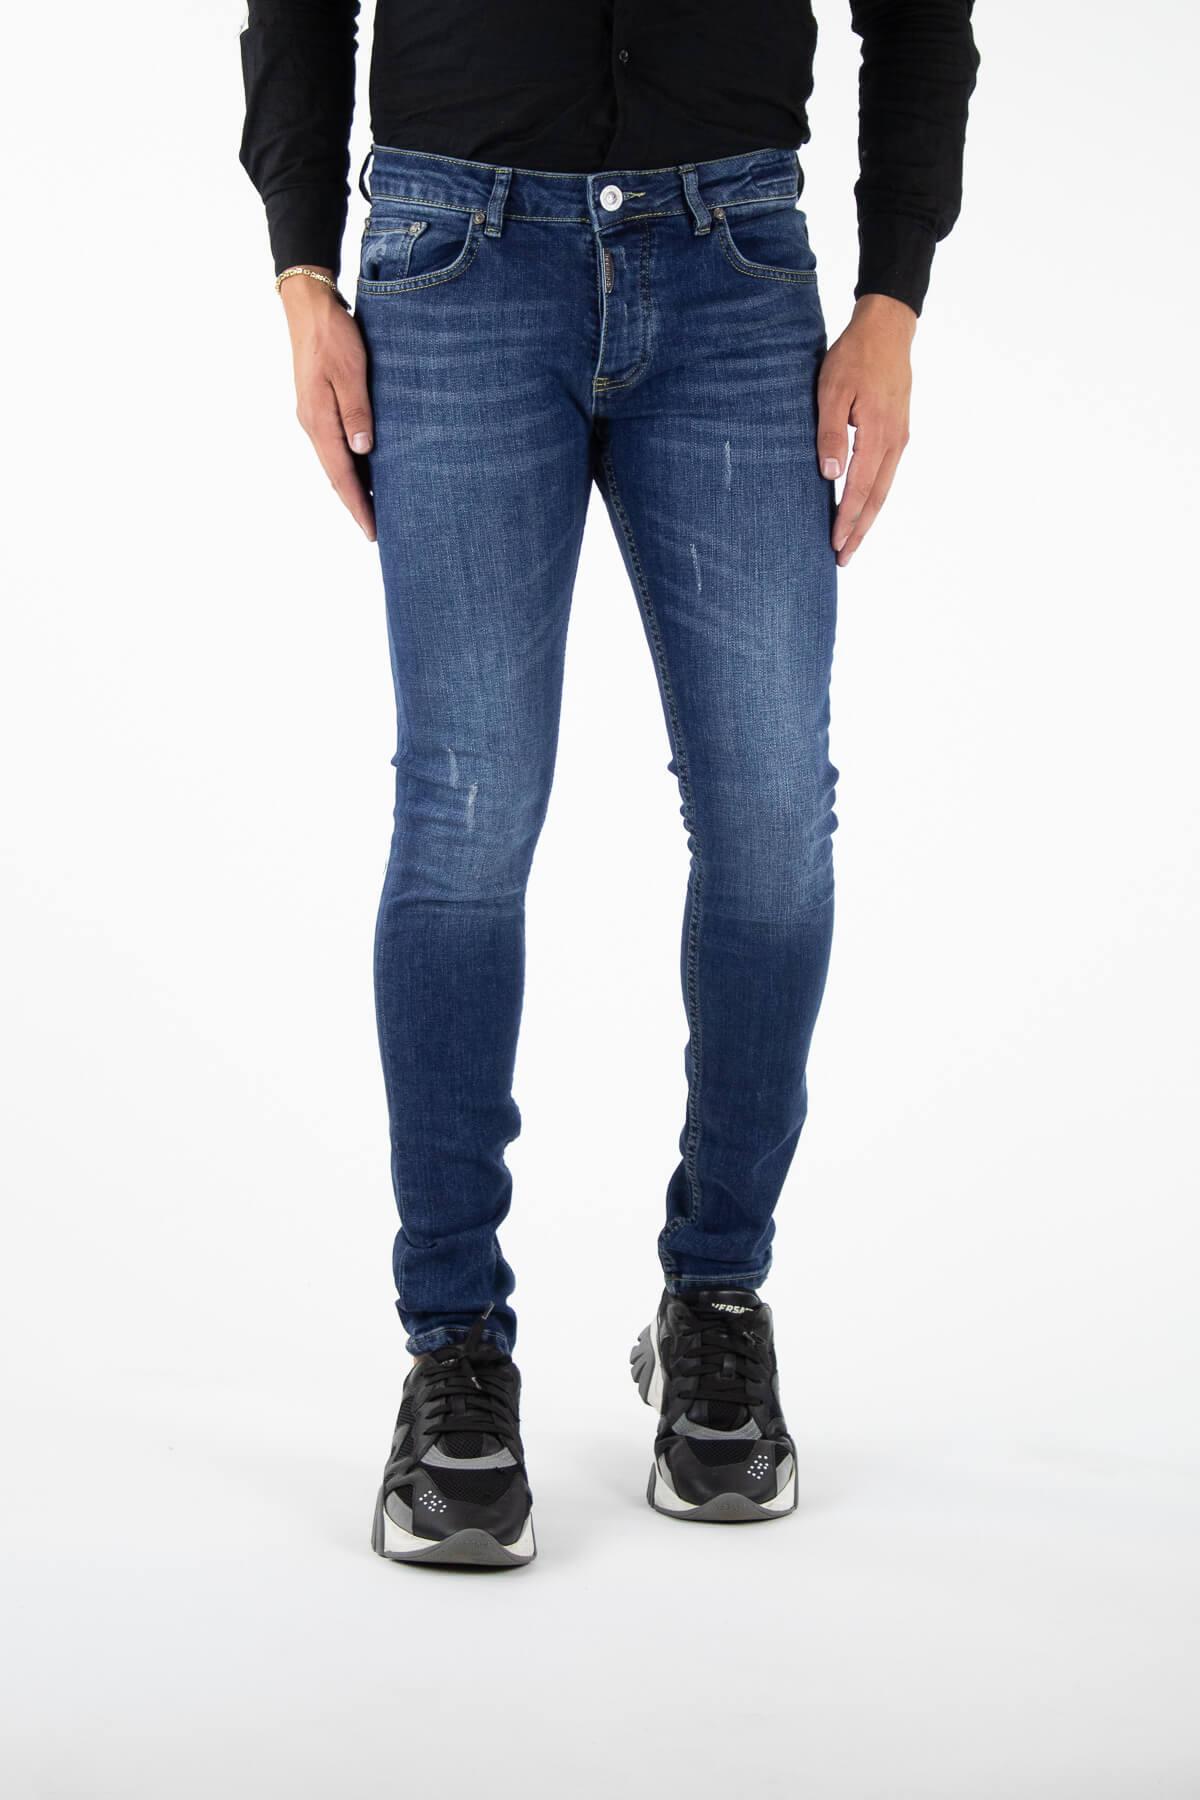 Morlaix Deluxe Blue Jeans-1